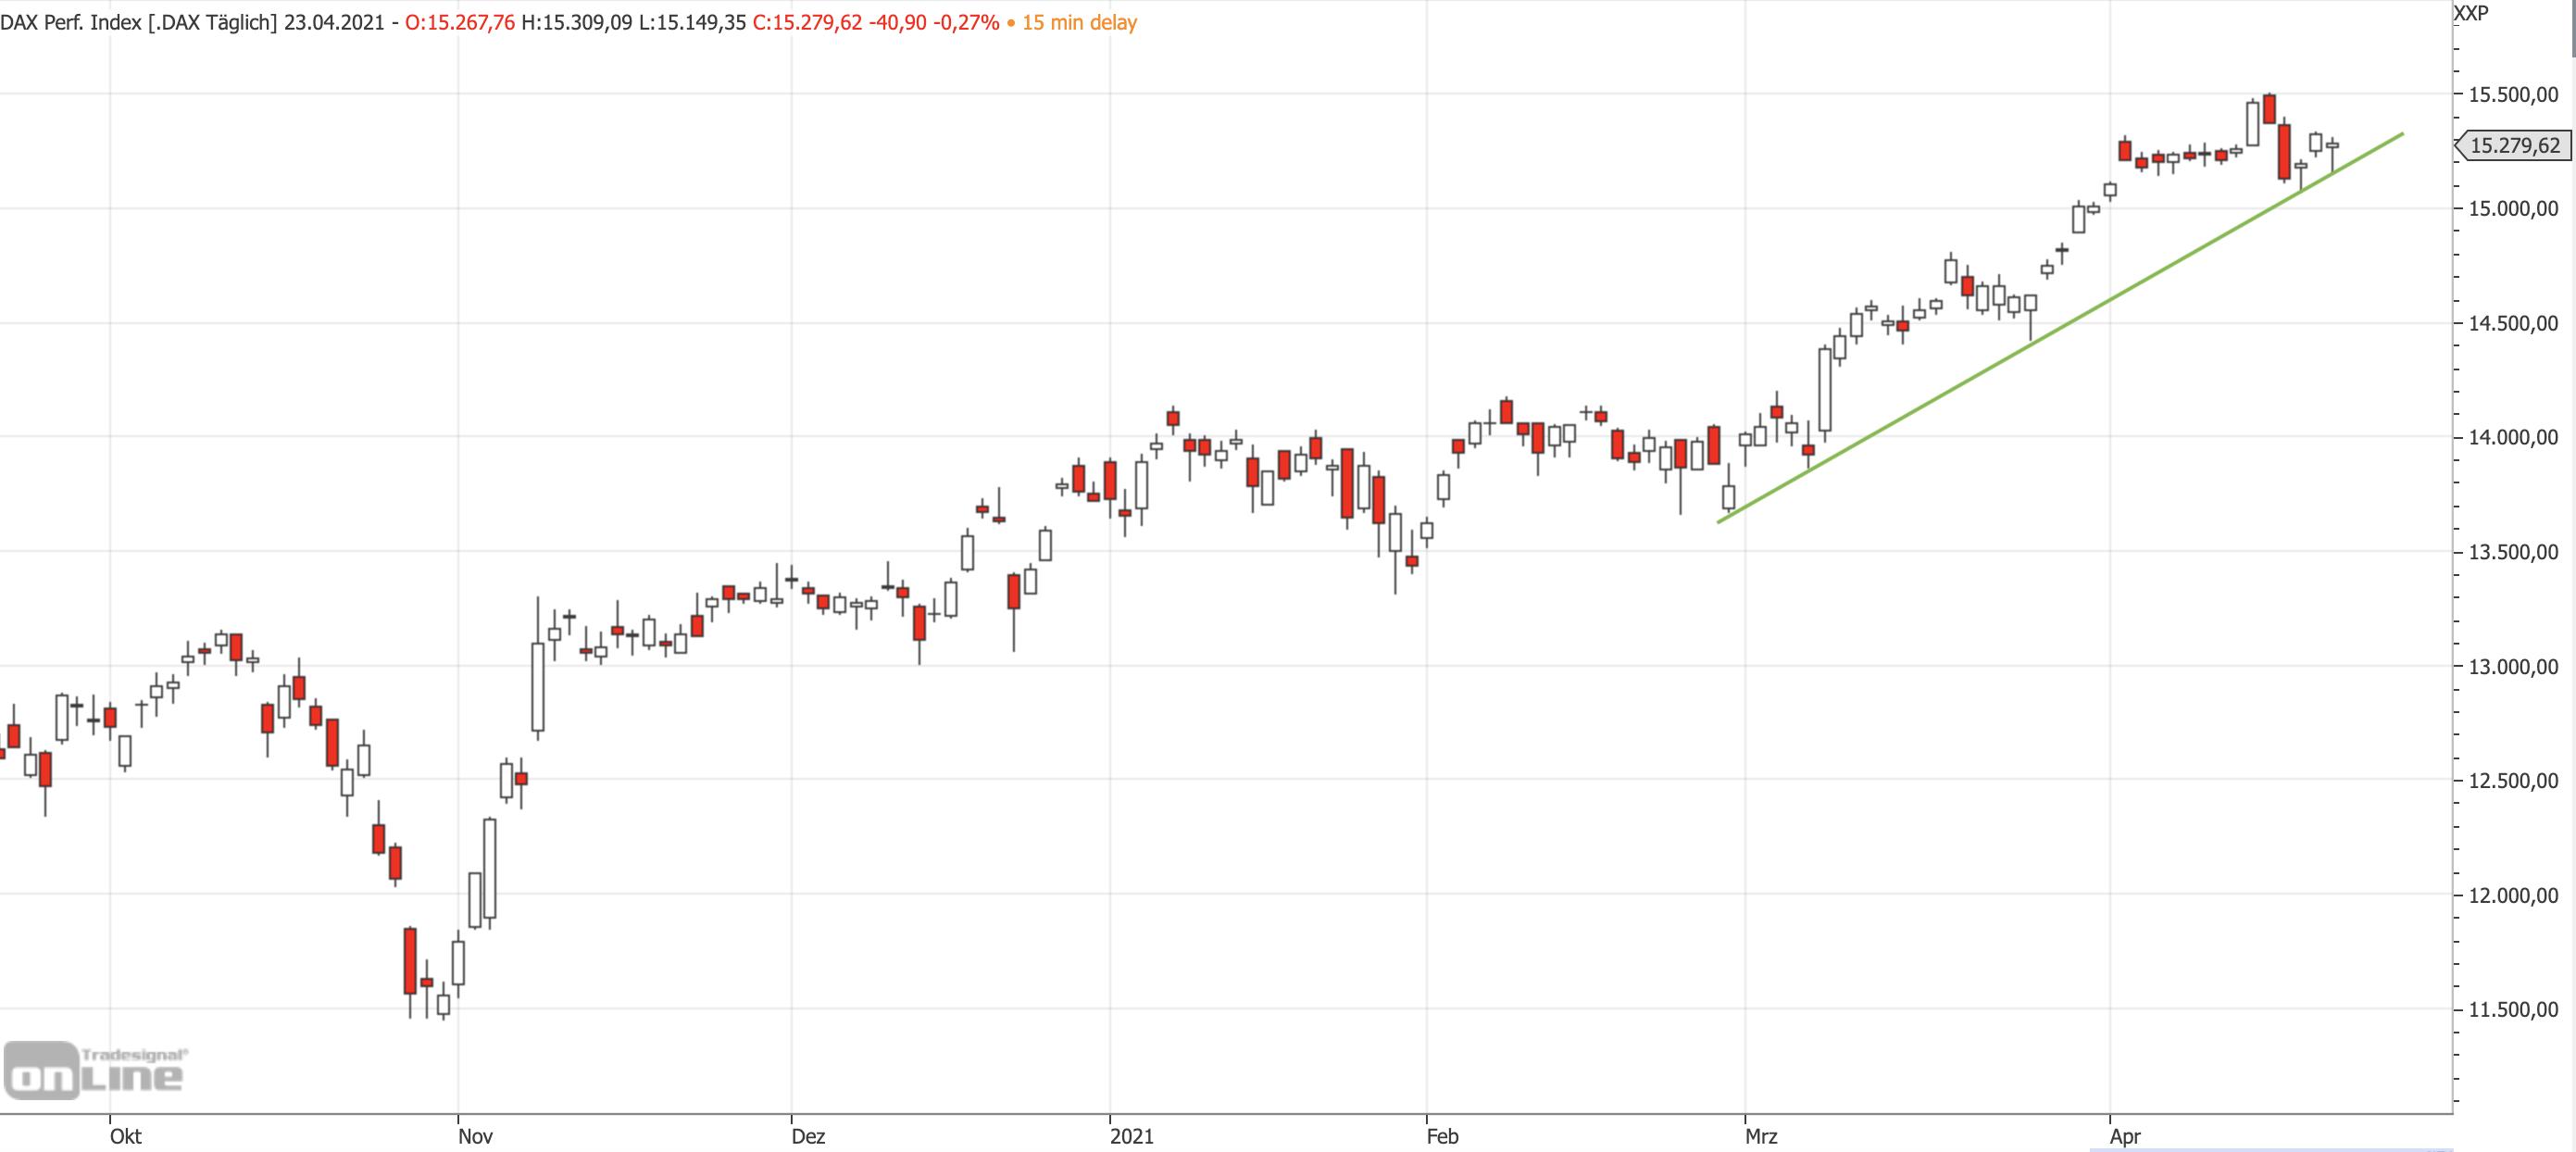 Mittelfristiger DAX-Chart am 23.04.2021